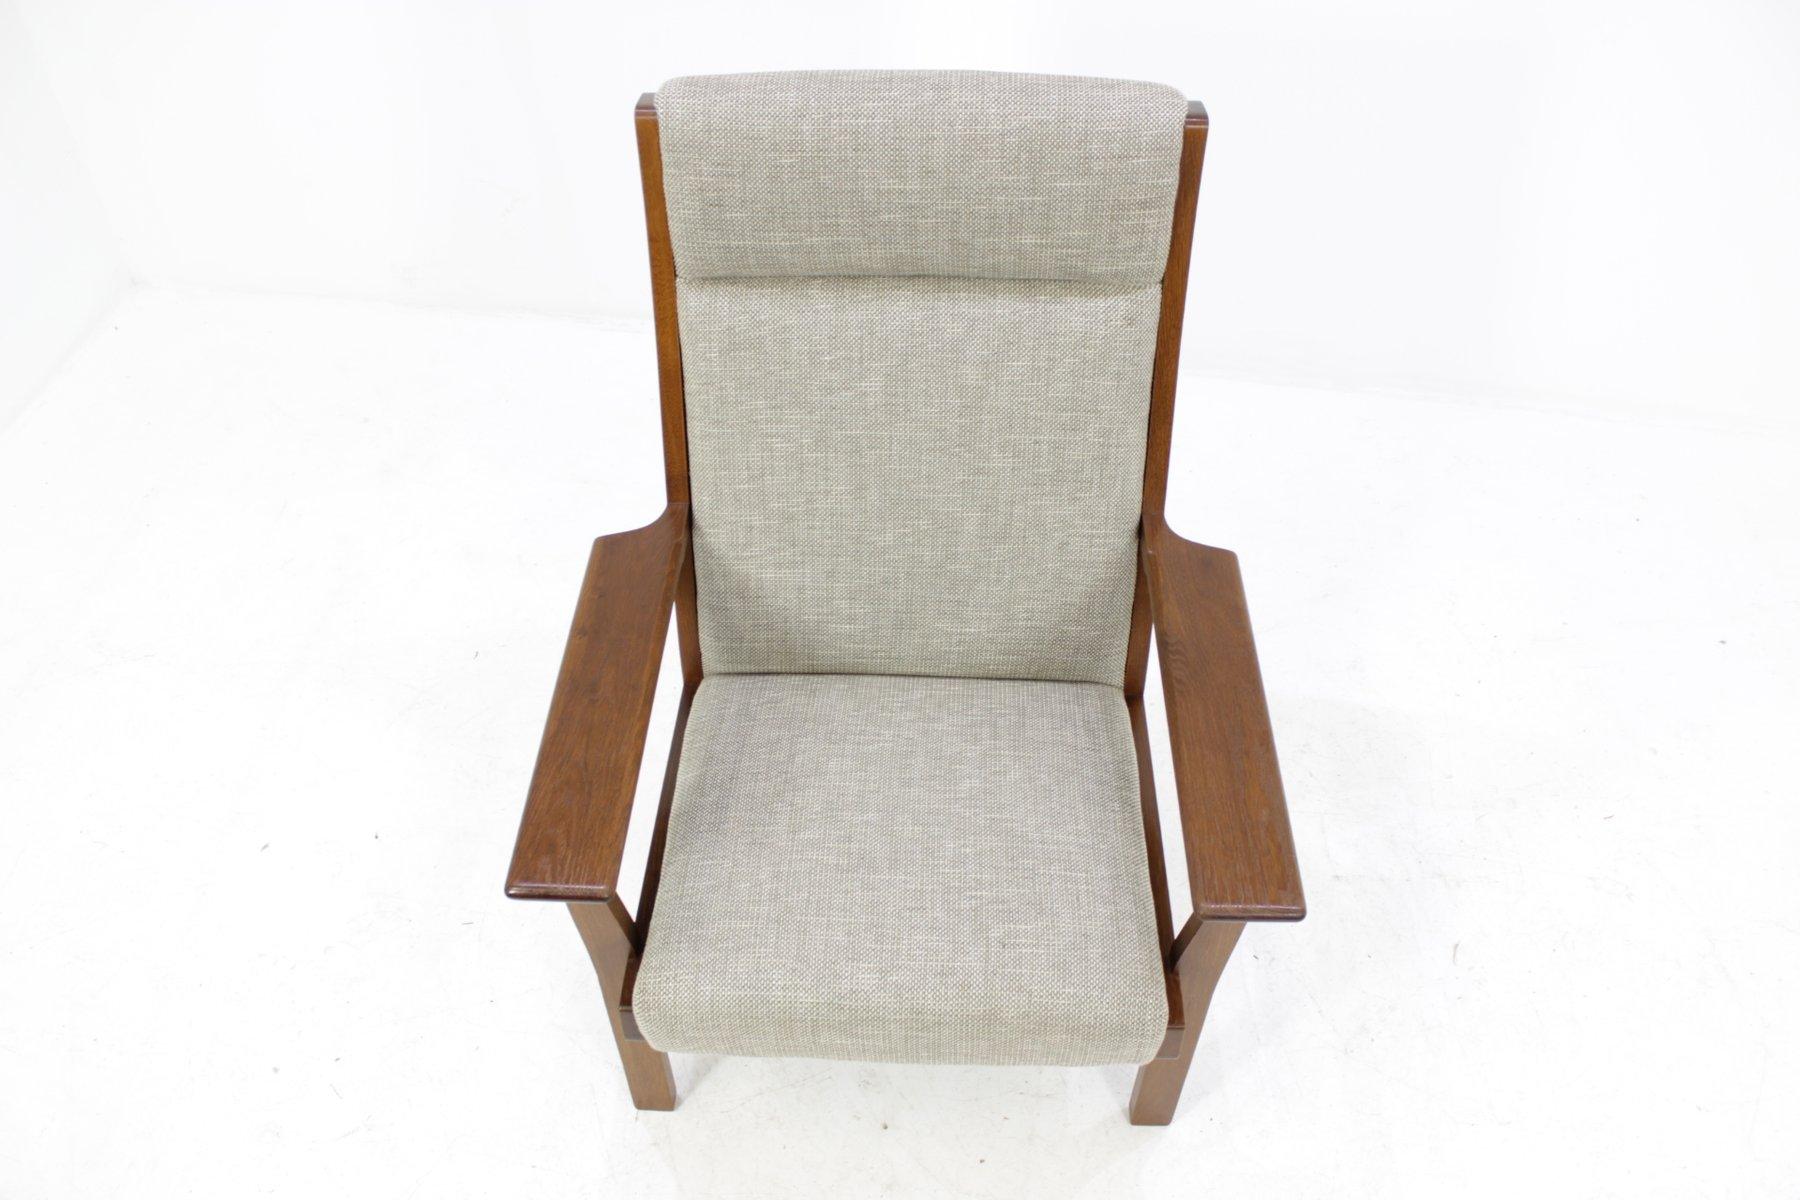 Vintage GE181A High Back Easy Chair by Hans J Wegner for Getama